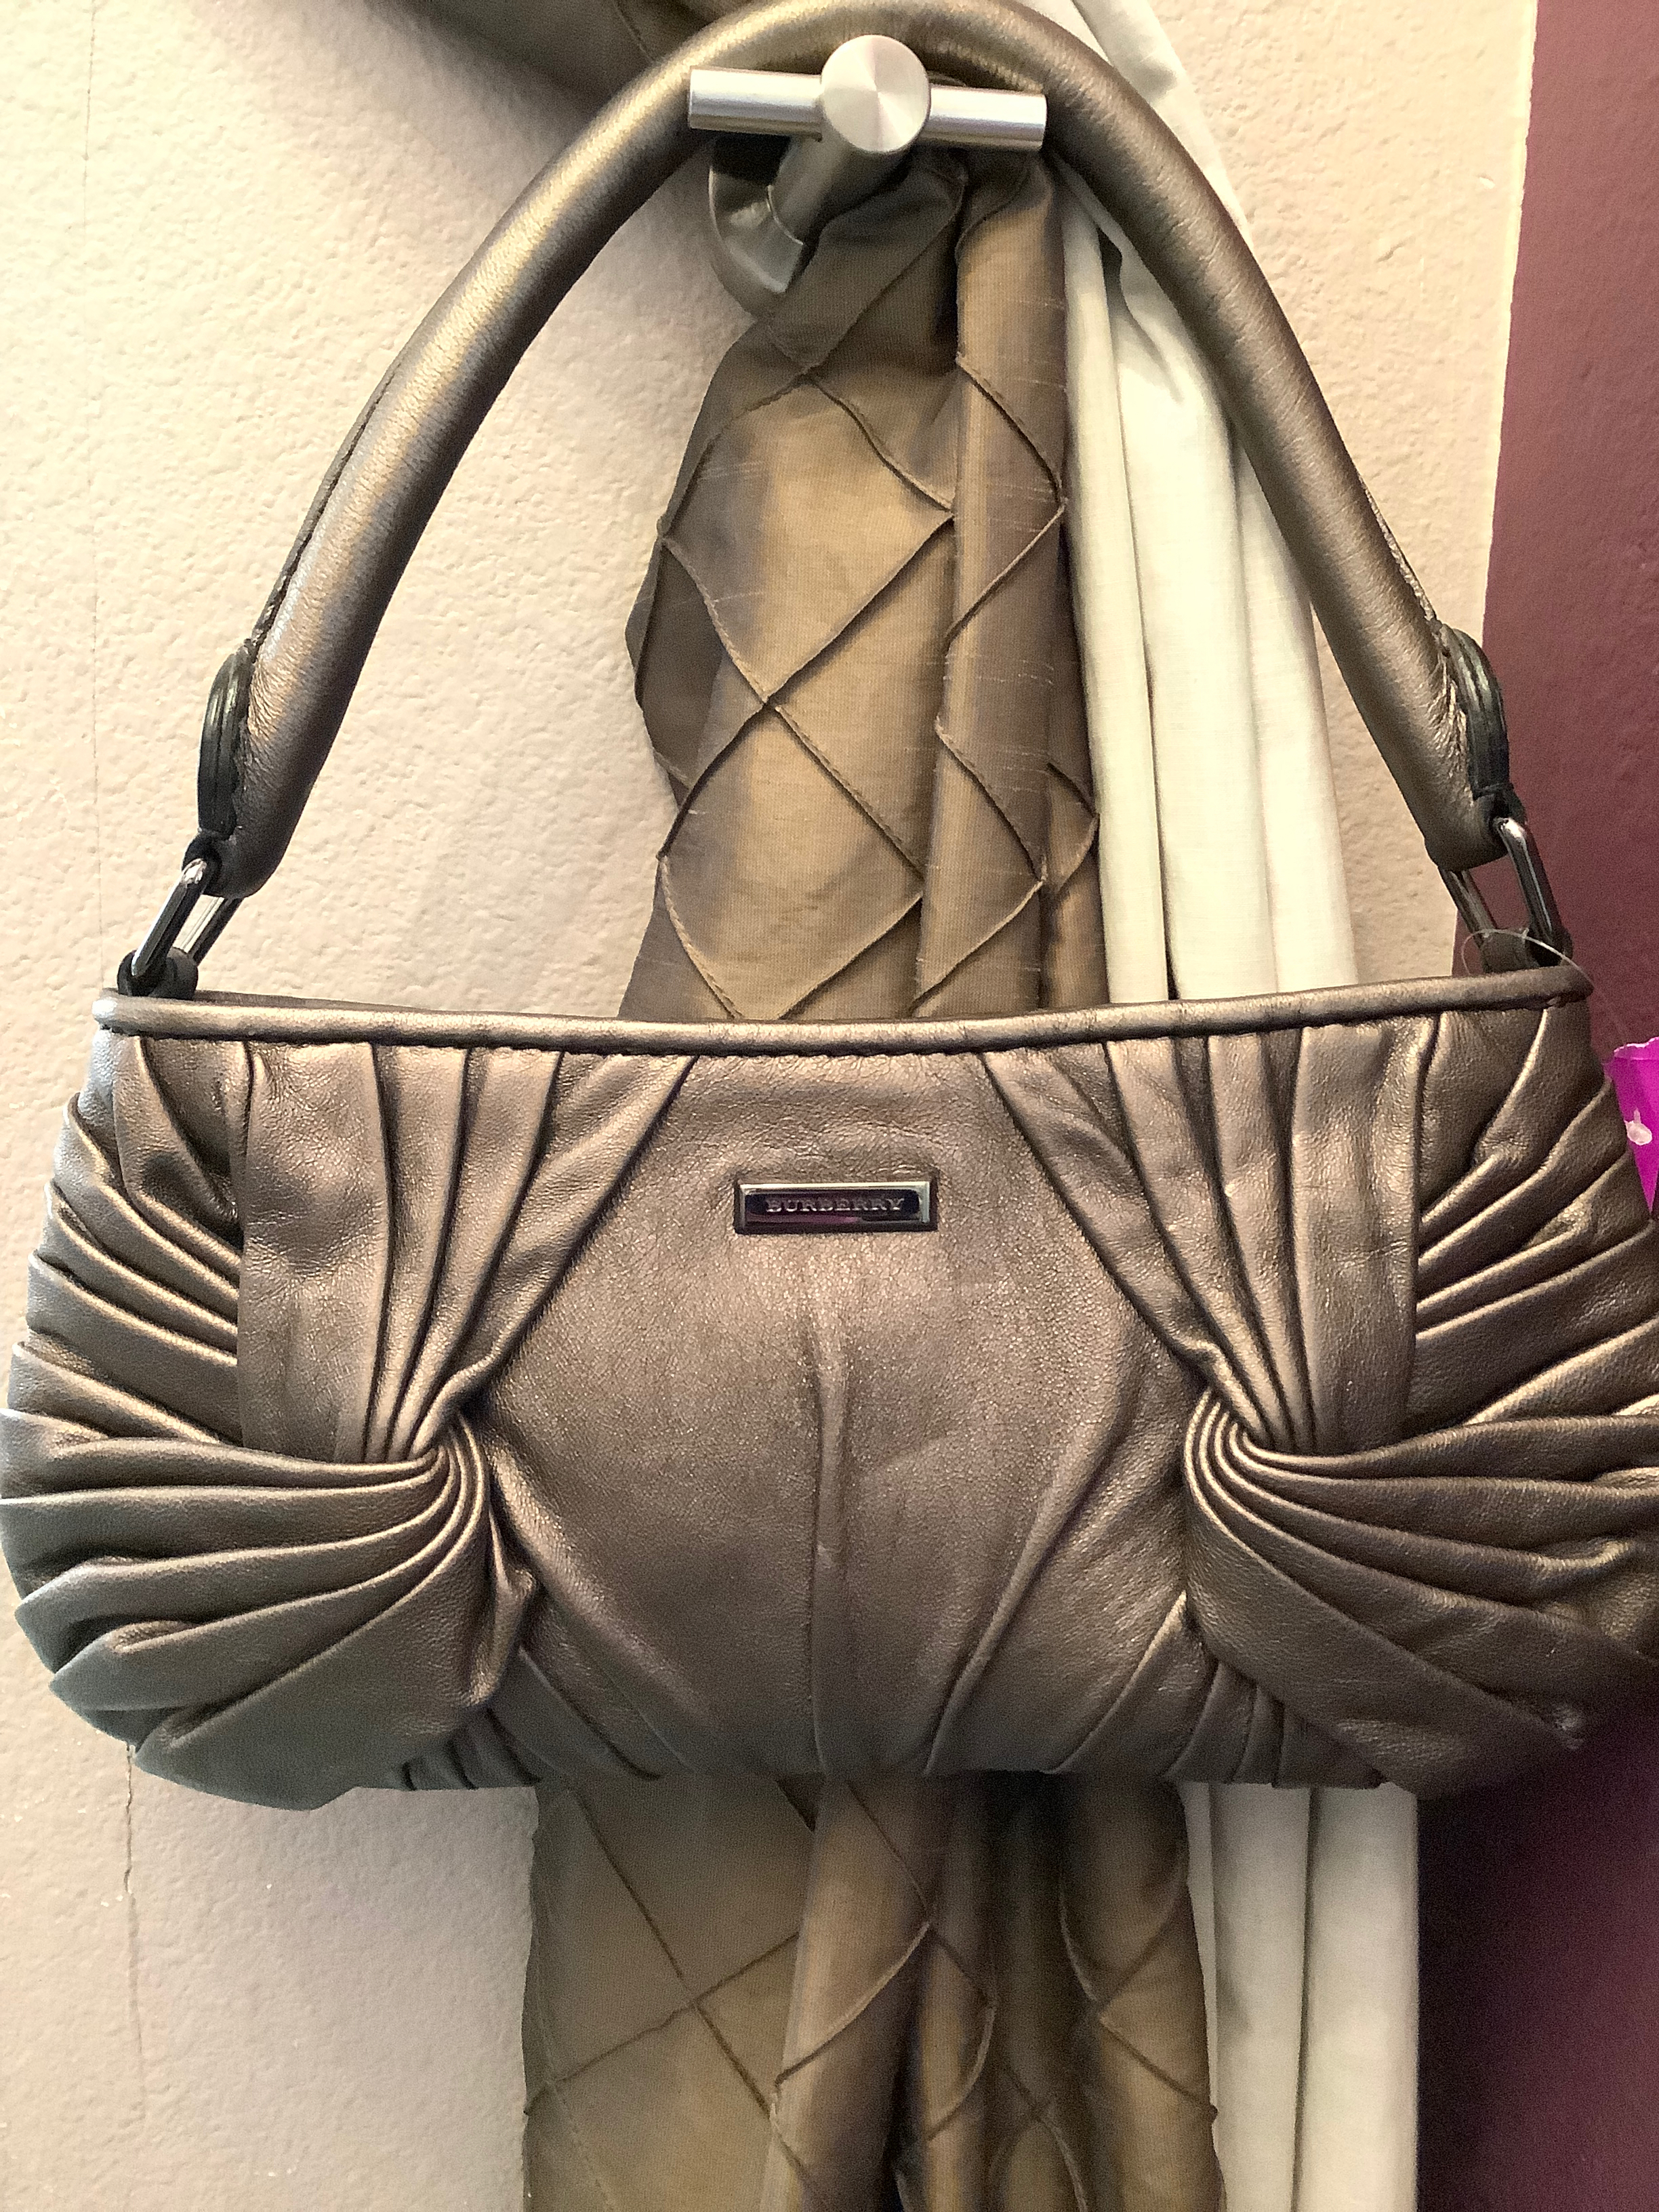 Burberry-Pewter-Handbag_234283A.jpg